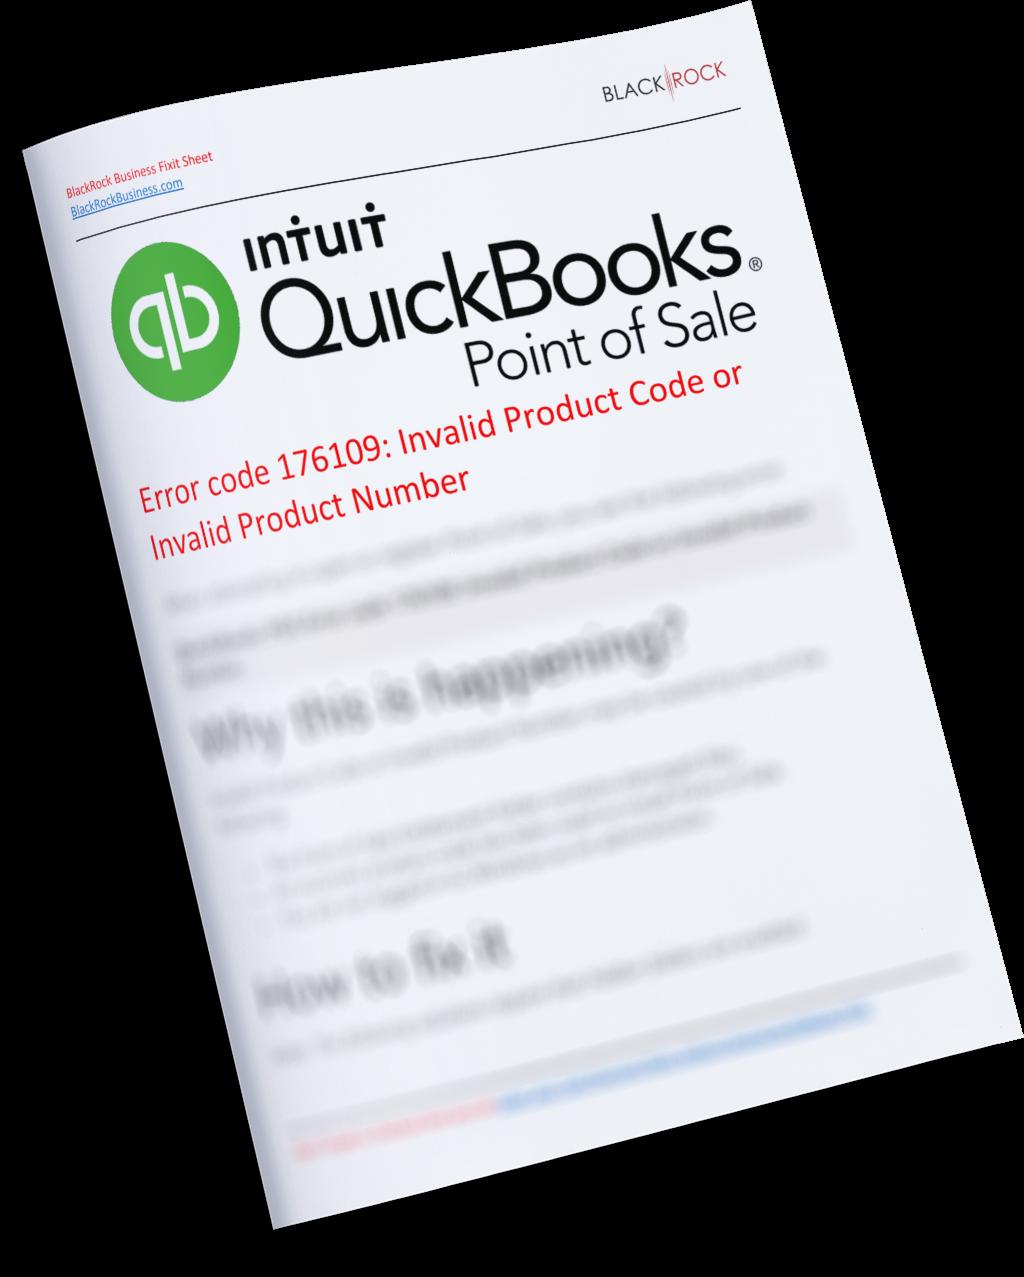 Quickbooks Pos V18 Crack